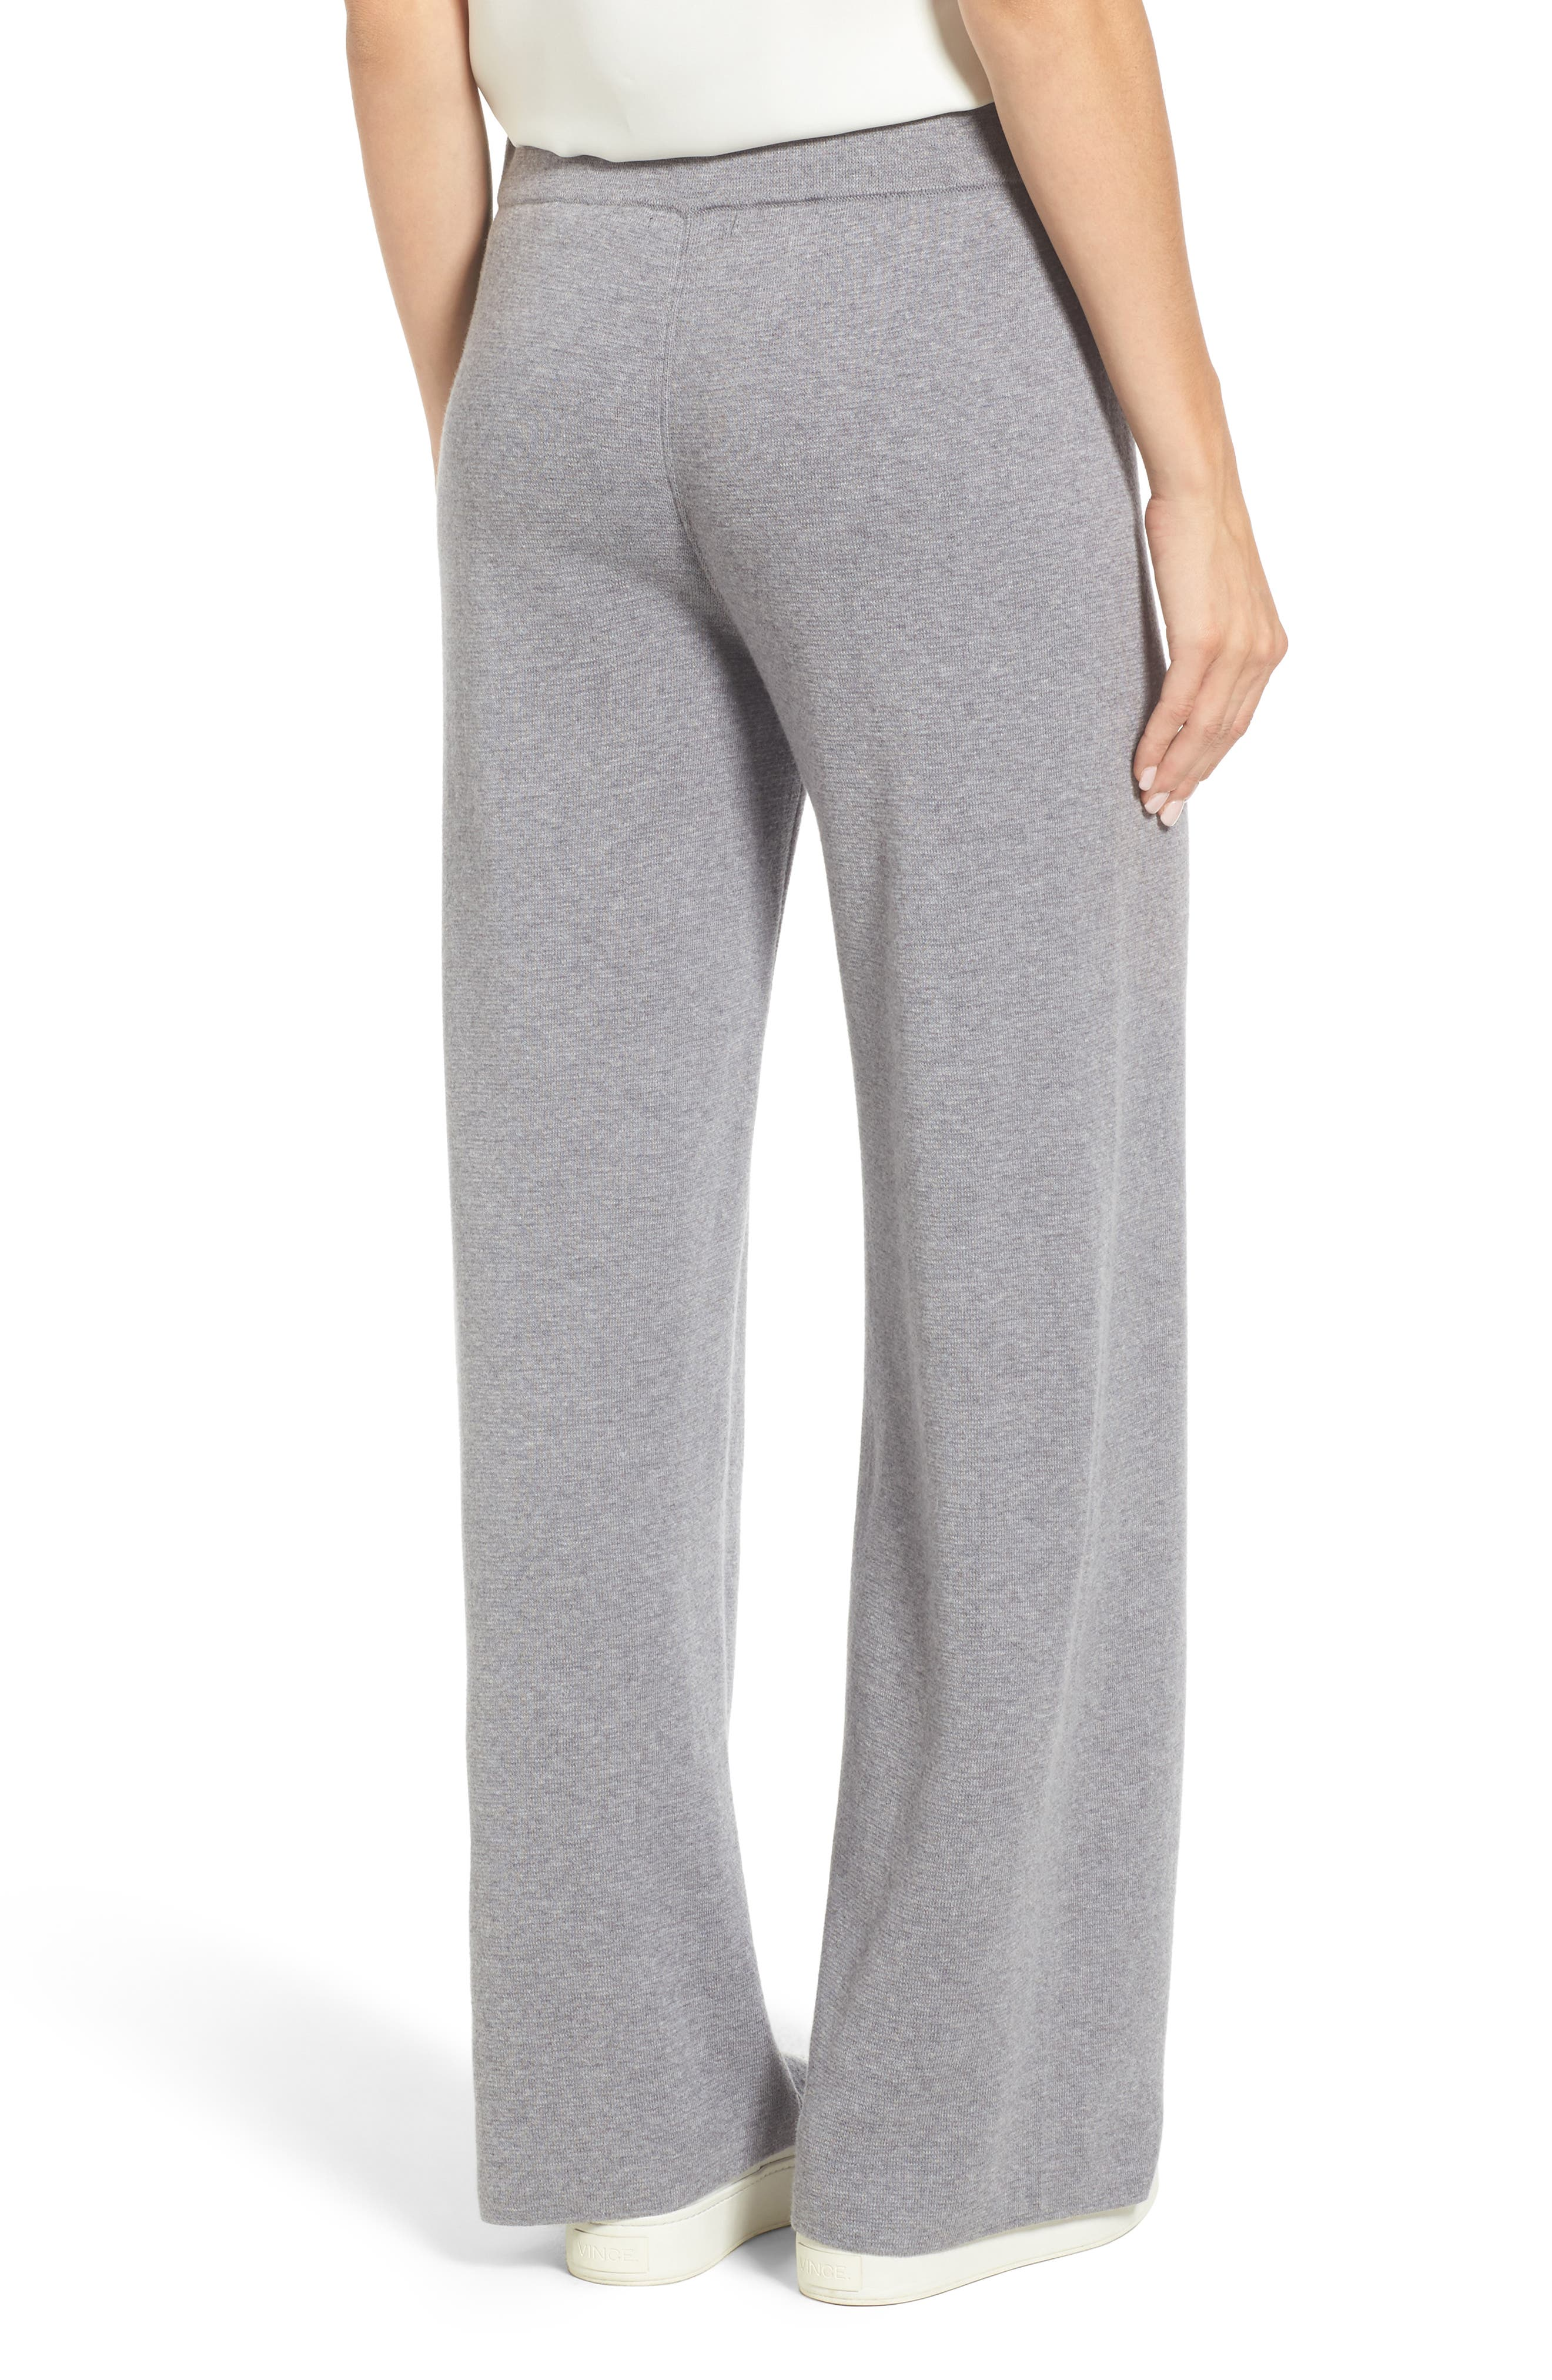 Heathered Knit Pants,                             Alternate thumbnail 2, color,                             WARM GREY